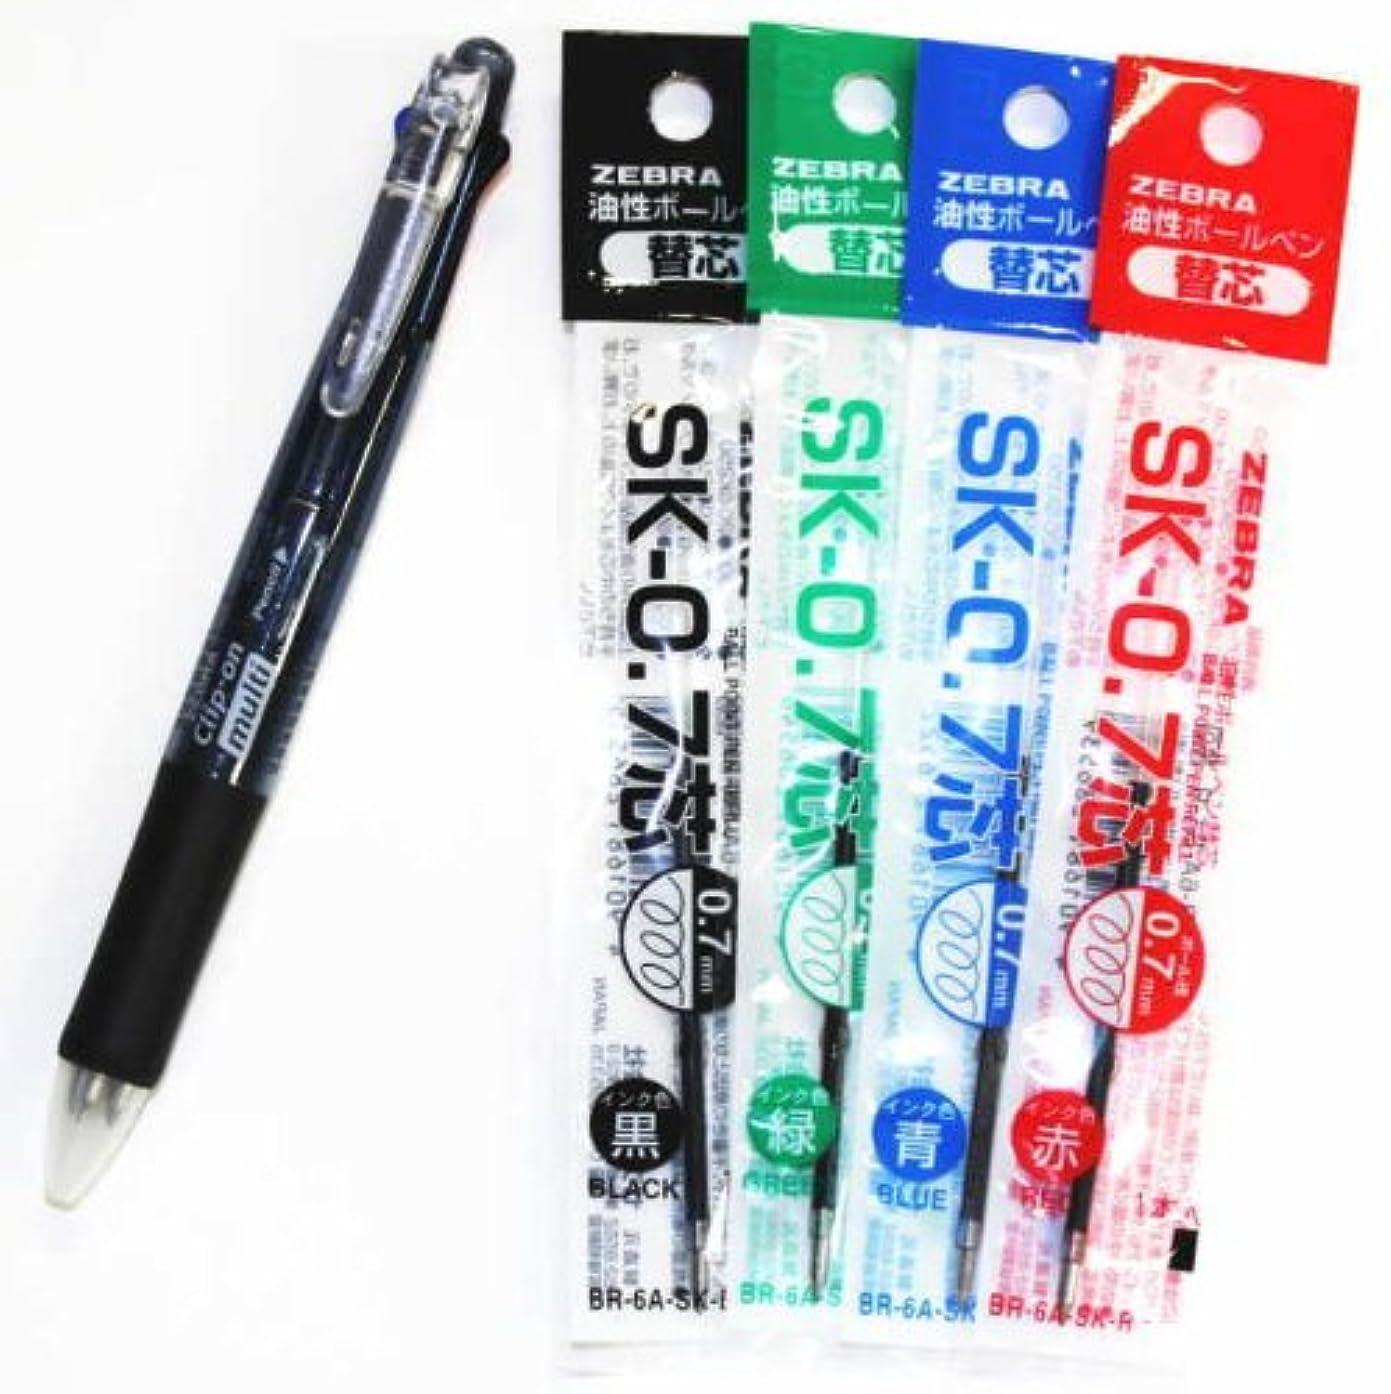 Zebra B4sa1 Clip-on Multi Multifunctional Pen (0.7mm Black, Blue, Red and Green + 0.5mm Mechanical Pencil) - Black Barrel & 4colors Ink Pens Refills Value set(with Values Japan Original Discription of Goods)